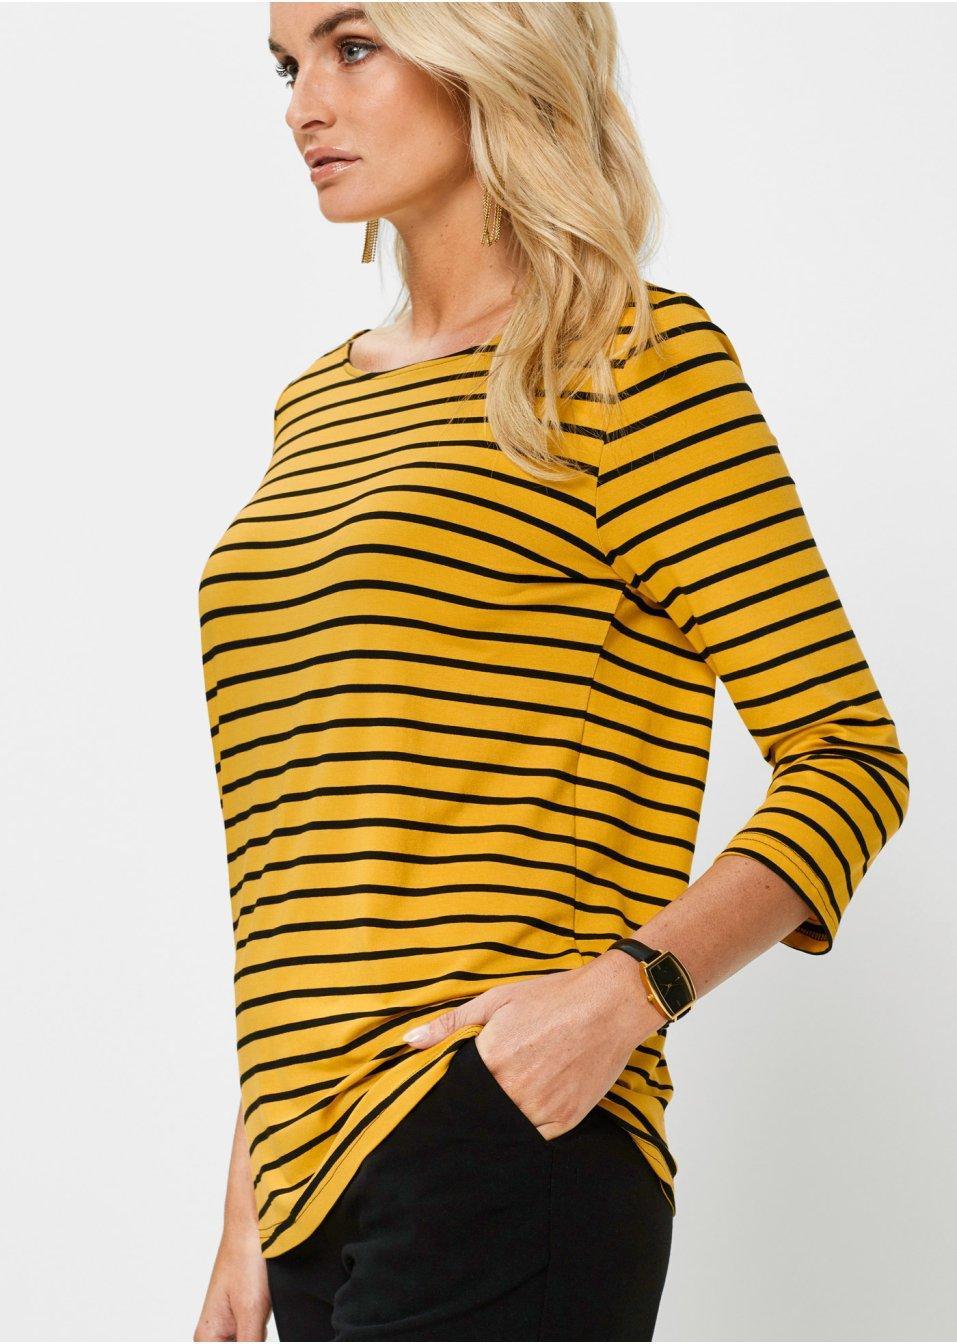 Mode Femme Vêtements DJLfdOFlkj T-shirt manches 3/4 curry/noir rayé Femme bpc selection .fr